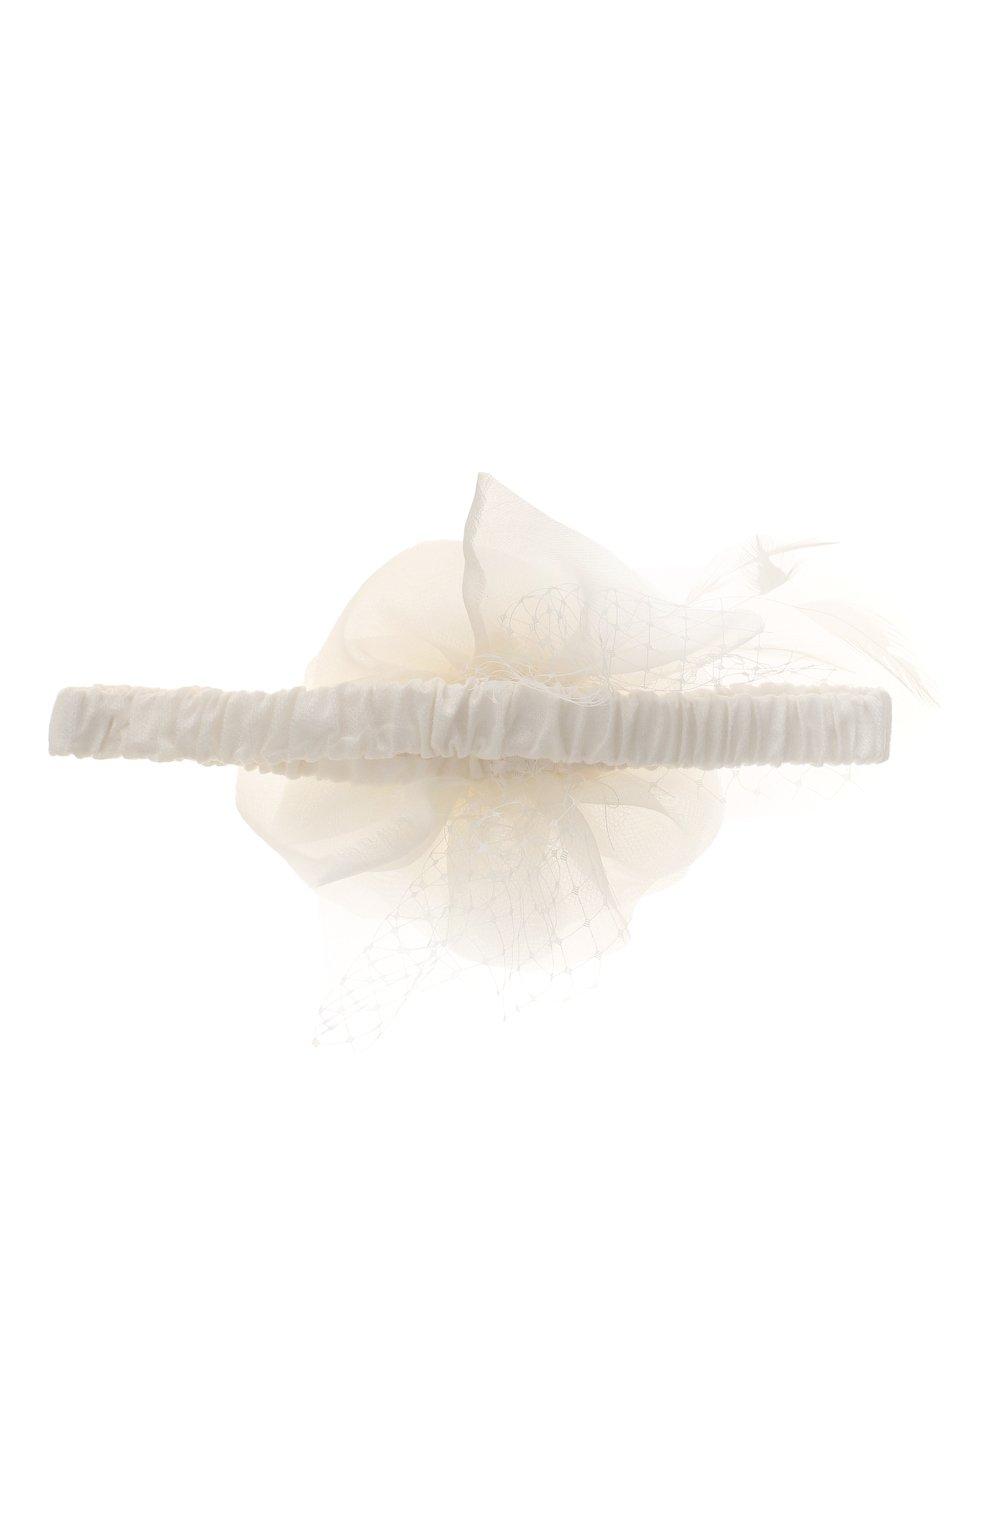 Детская повязка на голову DESIGNERS CAT бежевого цвета, арт. 100000K01000384 | Фото 2 (Материал: Текстиль, Шелк, Синтетический материал; Статус проверки: Проверено, Проверена категория)